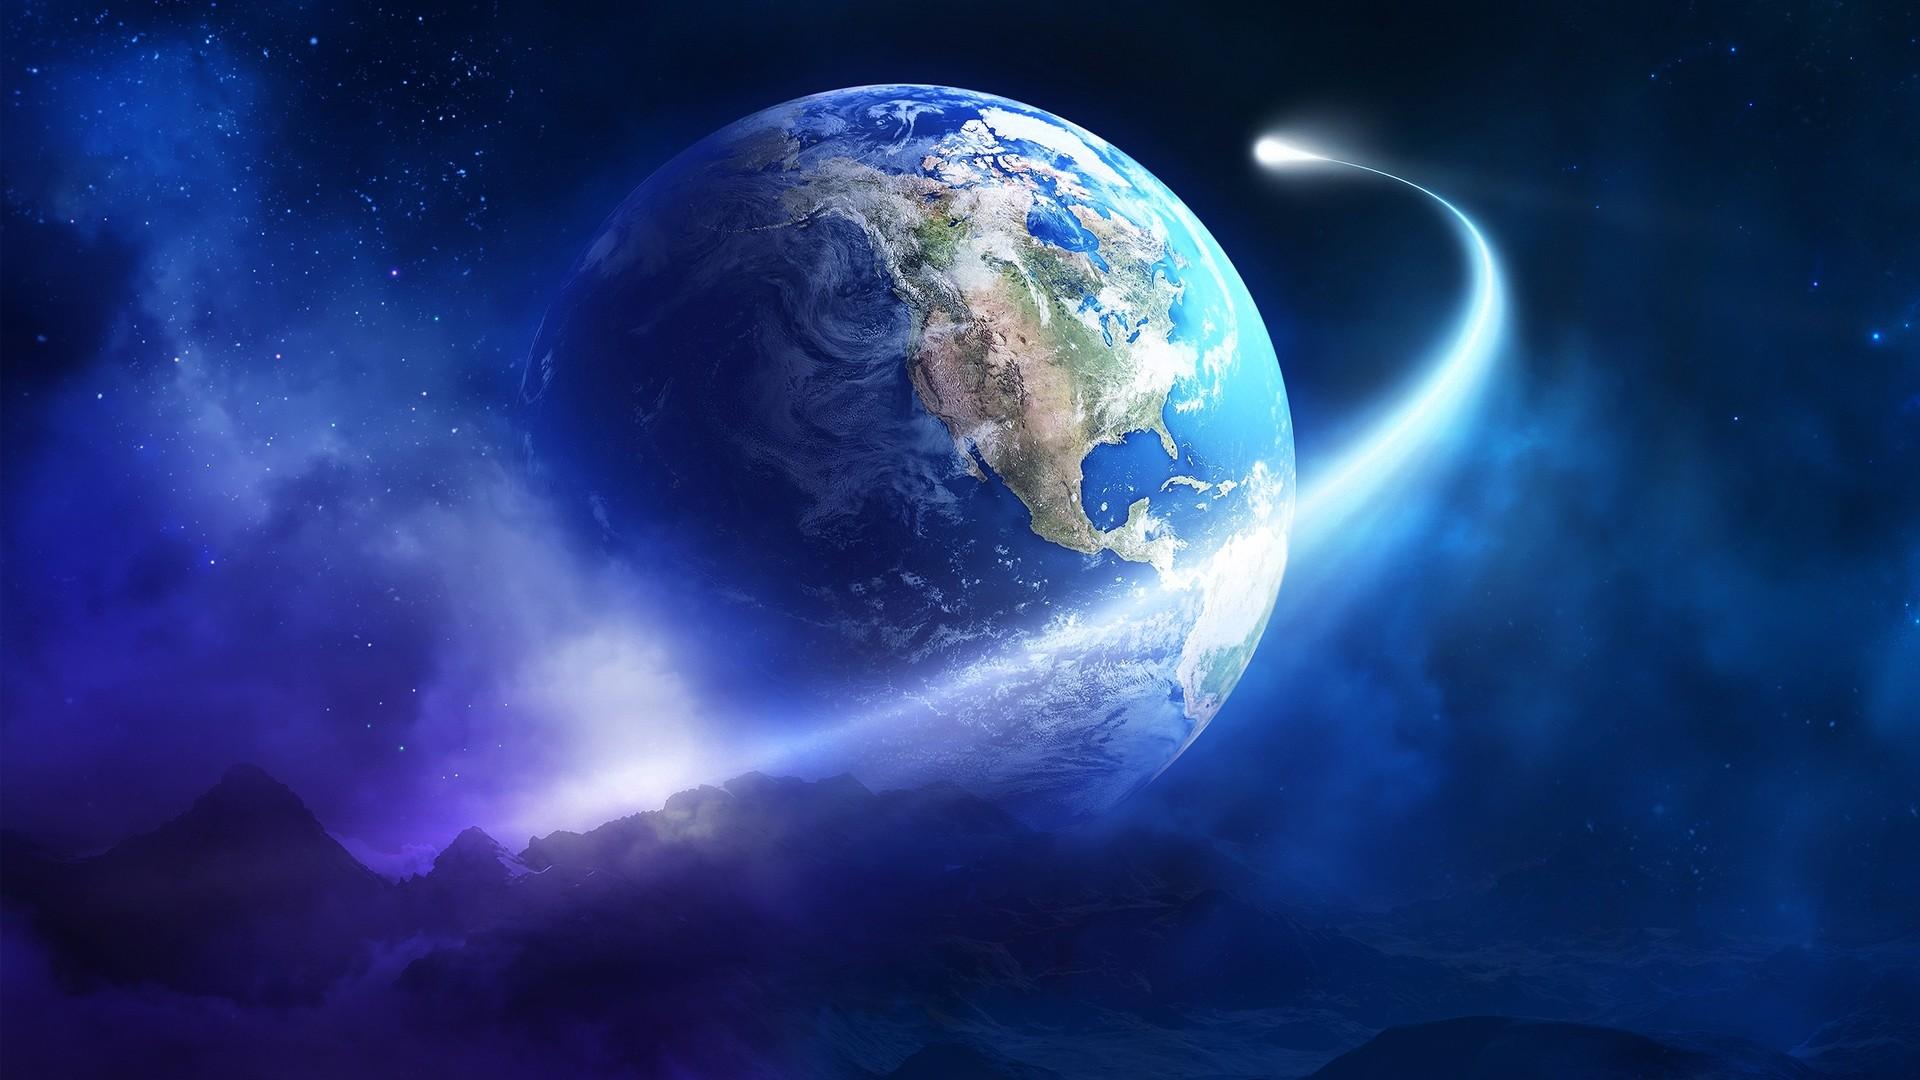 Planet Earth Background 1920x1080 Ikimarucom 1920x1080